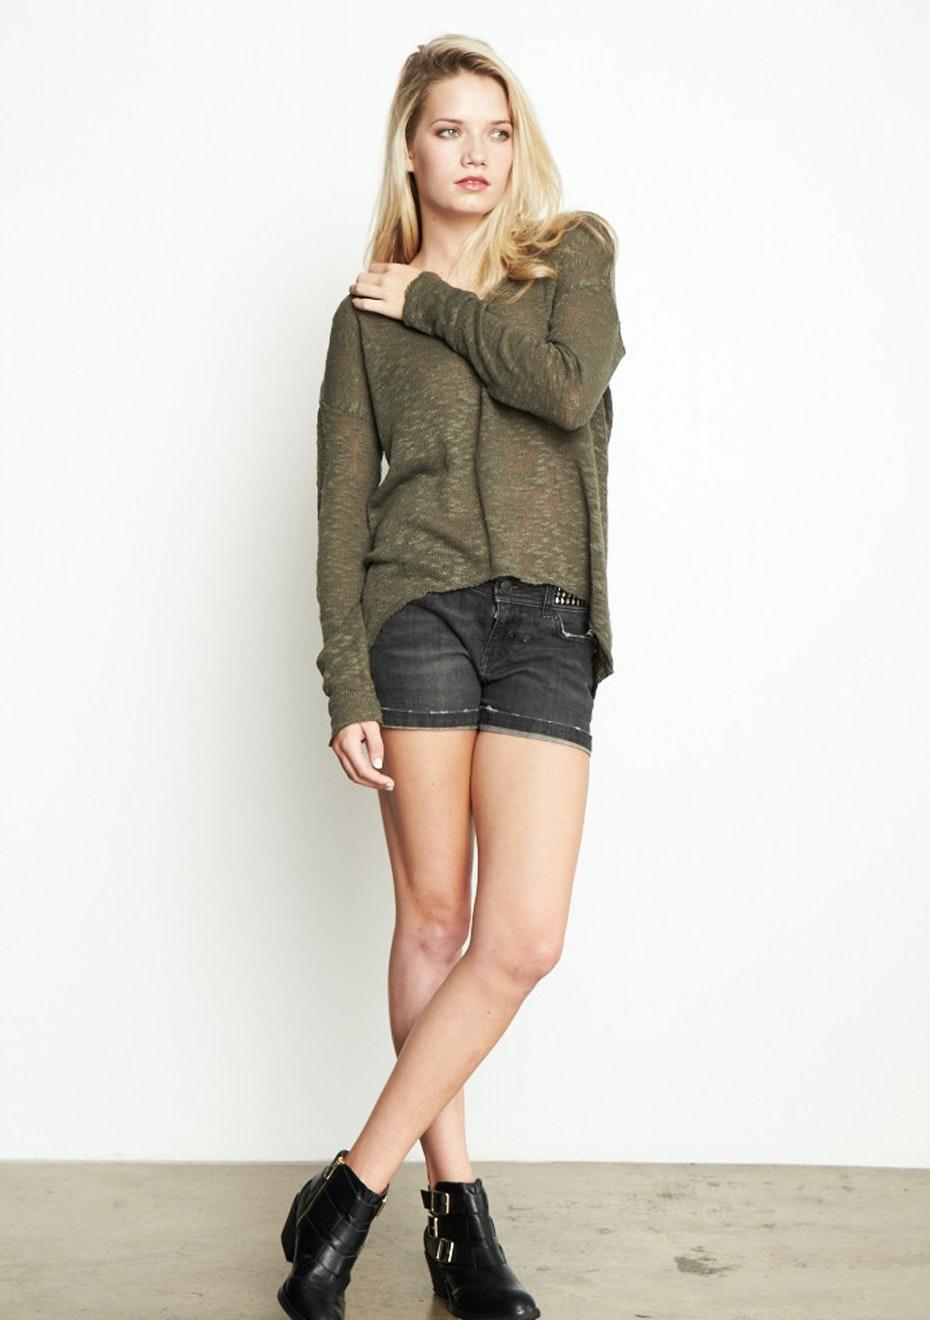 Achro - Semi-Sheer V-Neck Sweater - Olive